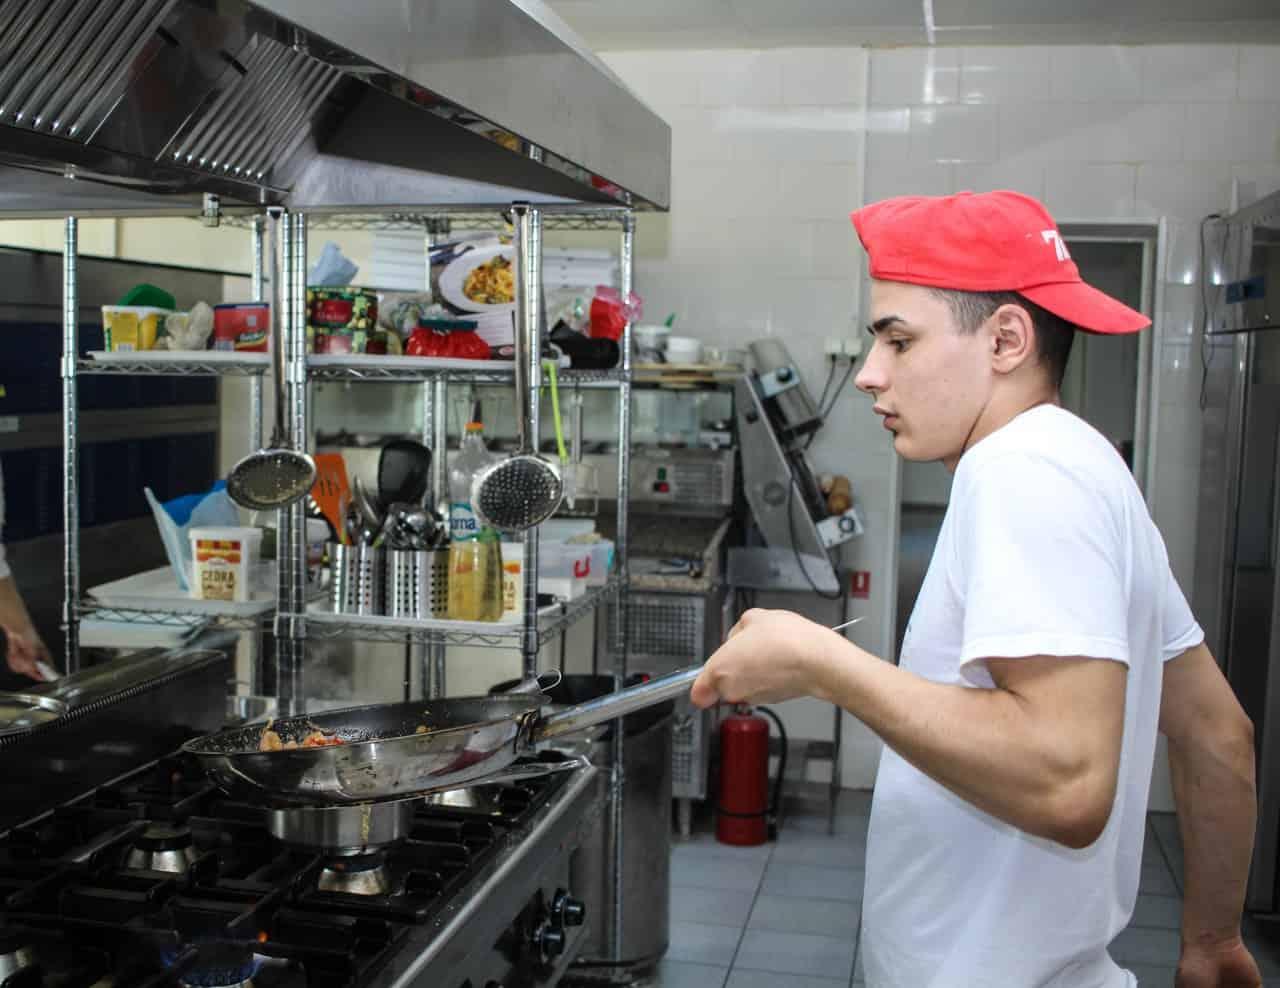 Prep Cook Job Description Duties Salary And More